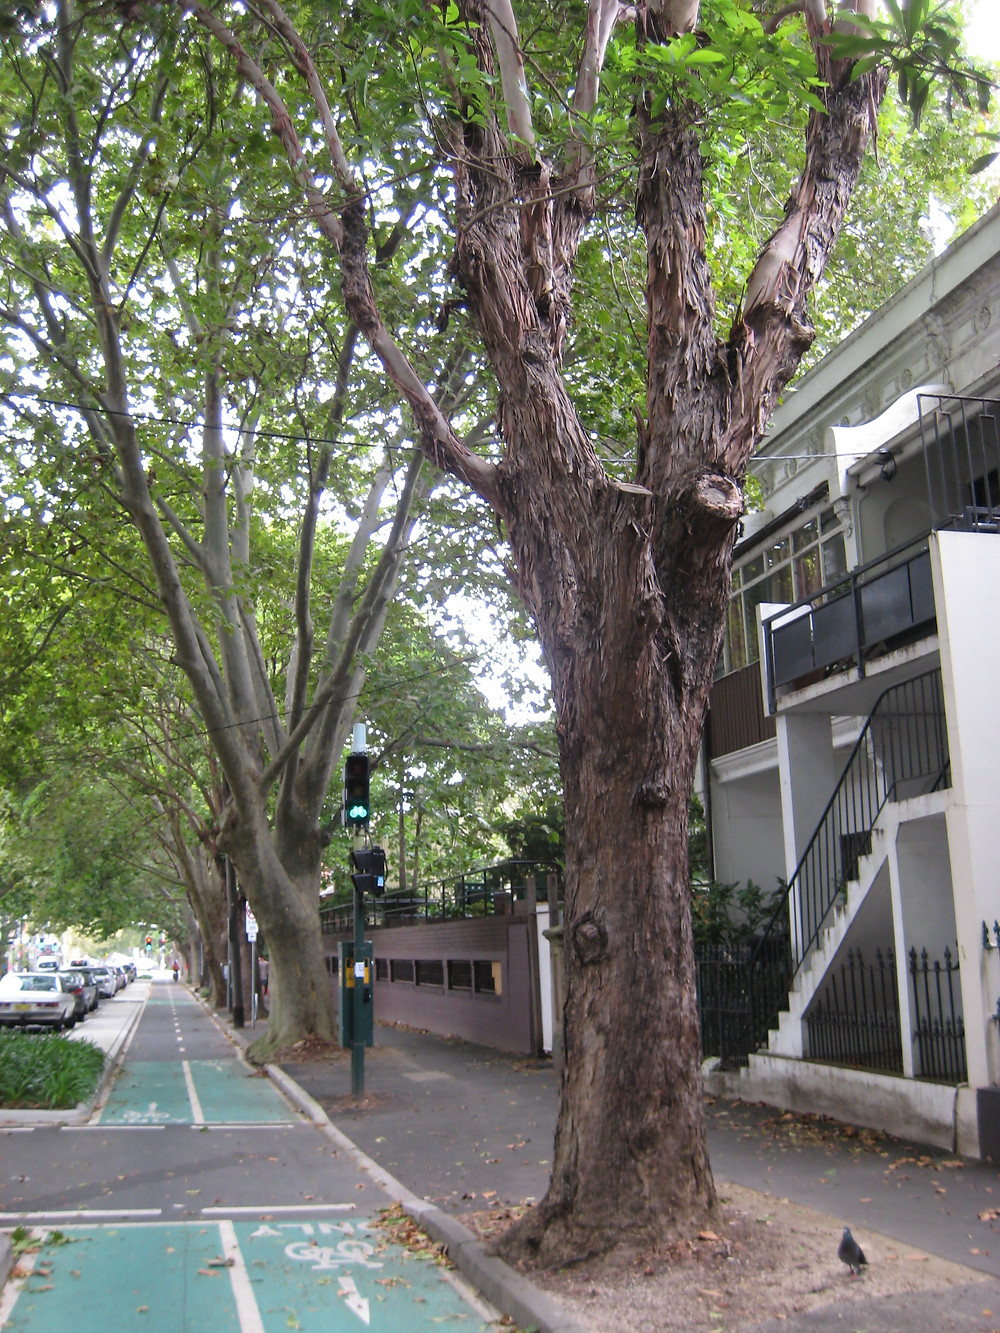 Sydney's cycle lanes